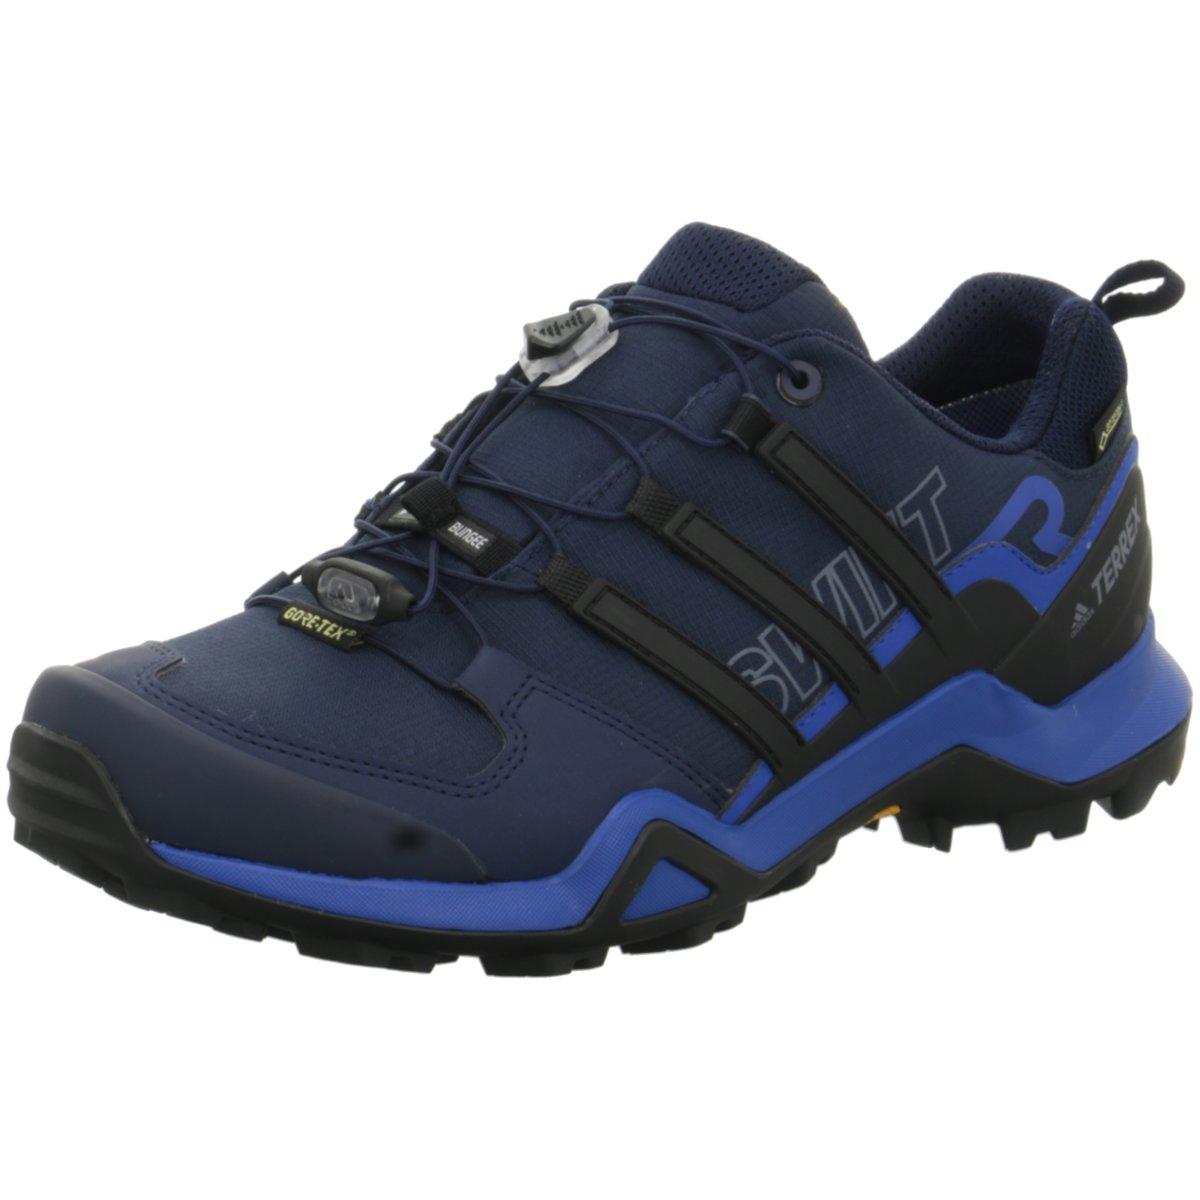 Adidas Herren Sportschuhe Terrex Swift R2 GTX CM7494 blau 404858